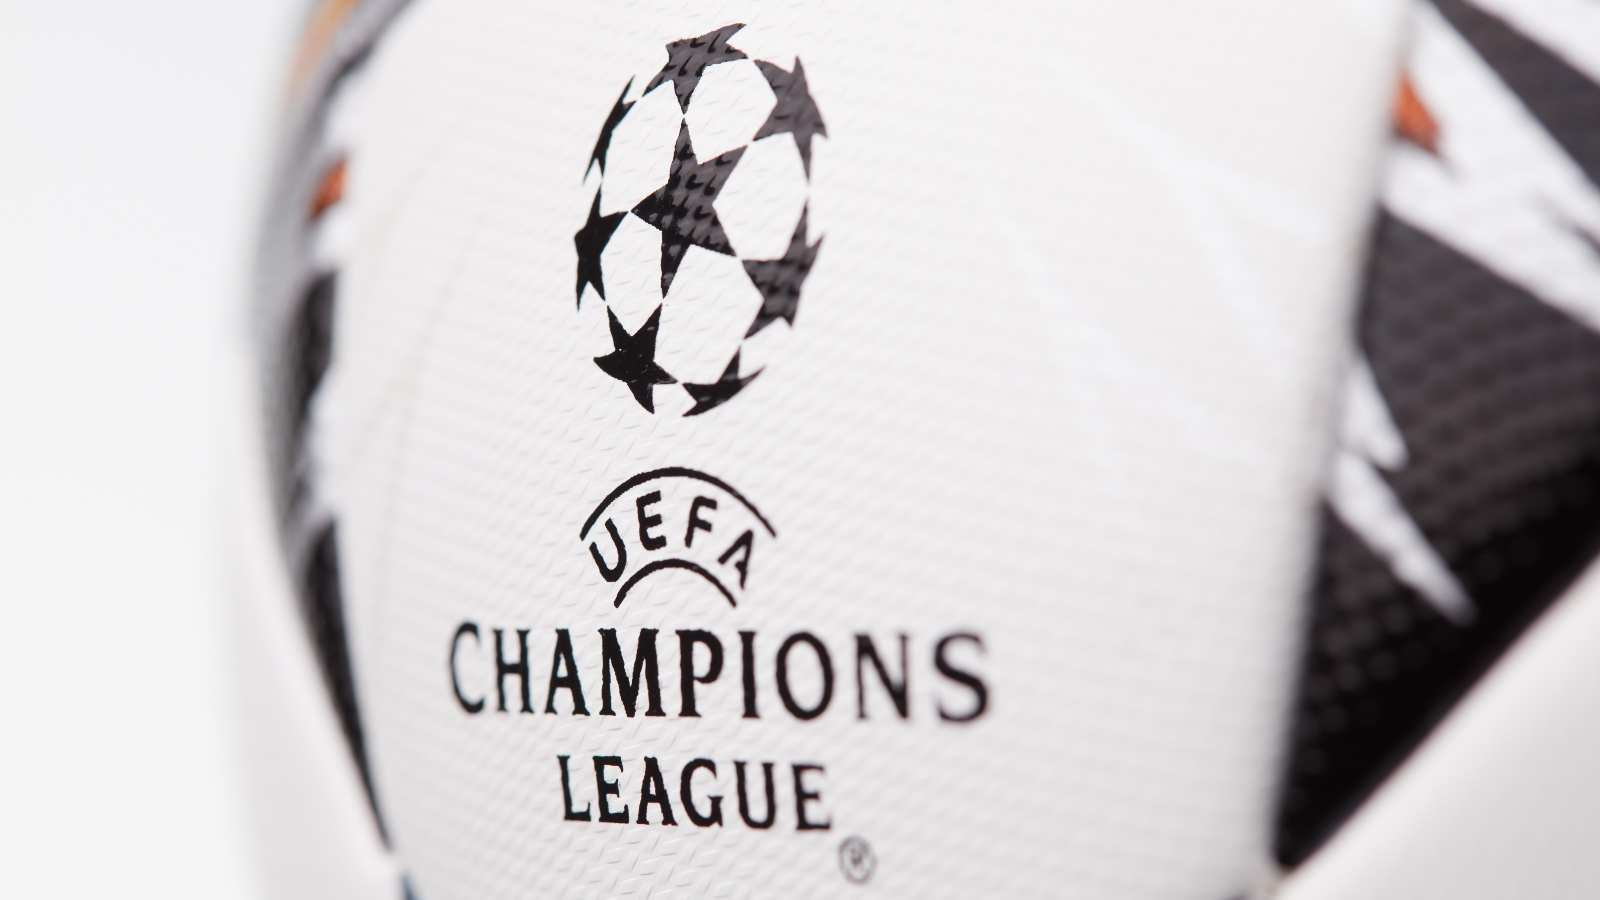 Download Uefa Champions League Logo Png 2020